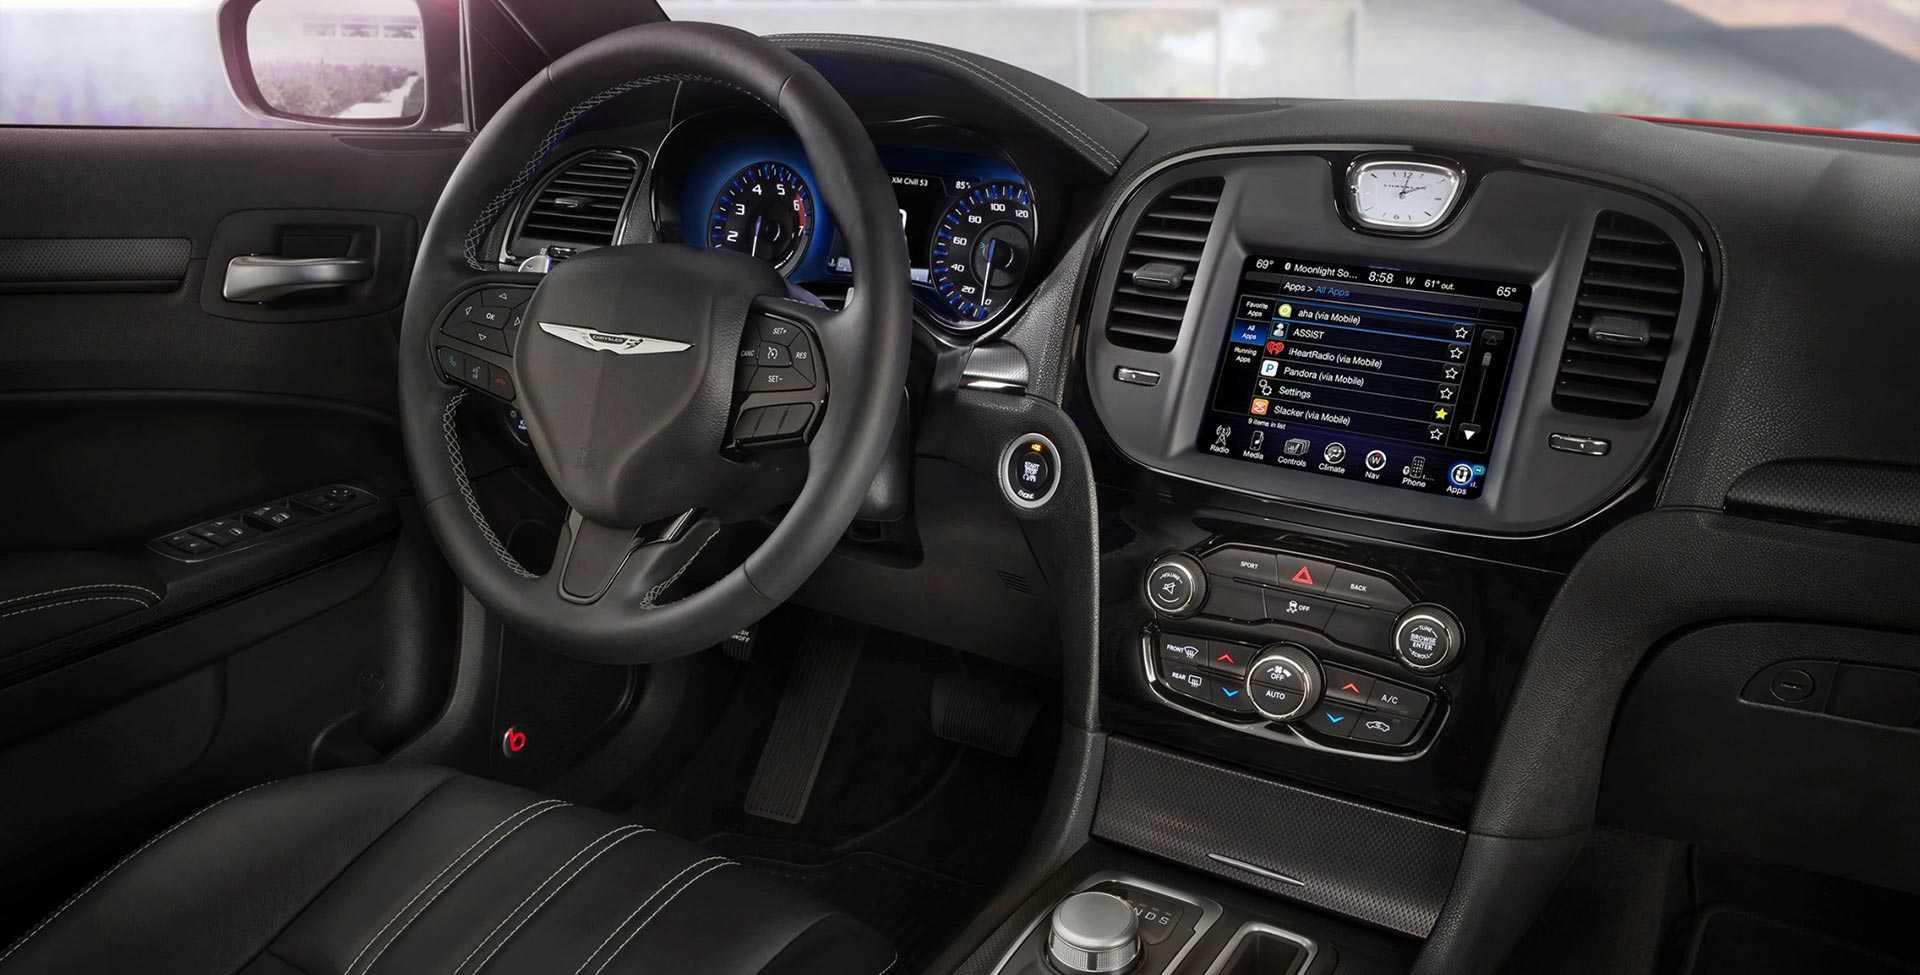 Uconnect Access App >> 2018 Chrysler 300 Lease NJ | 2018 Chrysler 300 Financing NJ